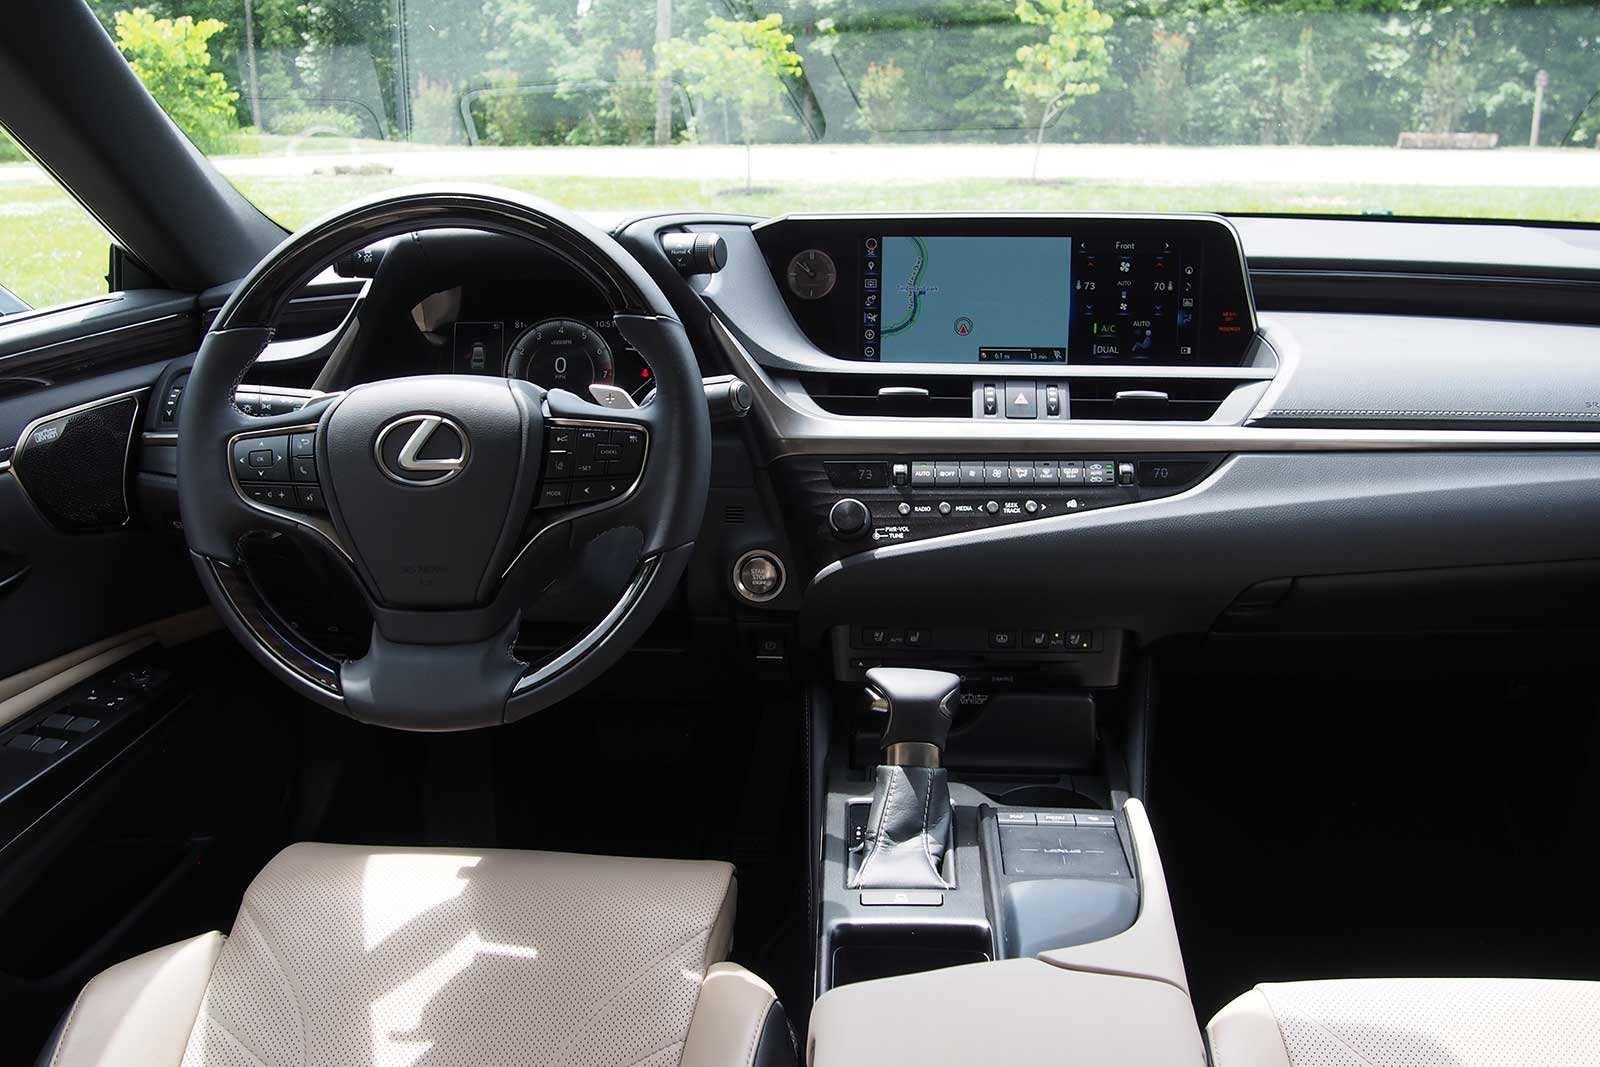 21 Gallery of 2019 Lexus Es 350 Pictures with 2019 Lexus Es 350